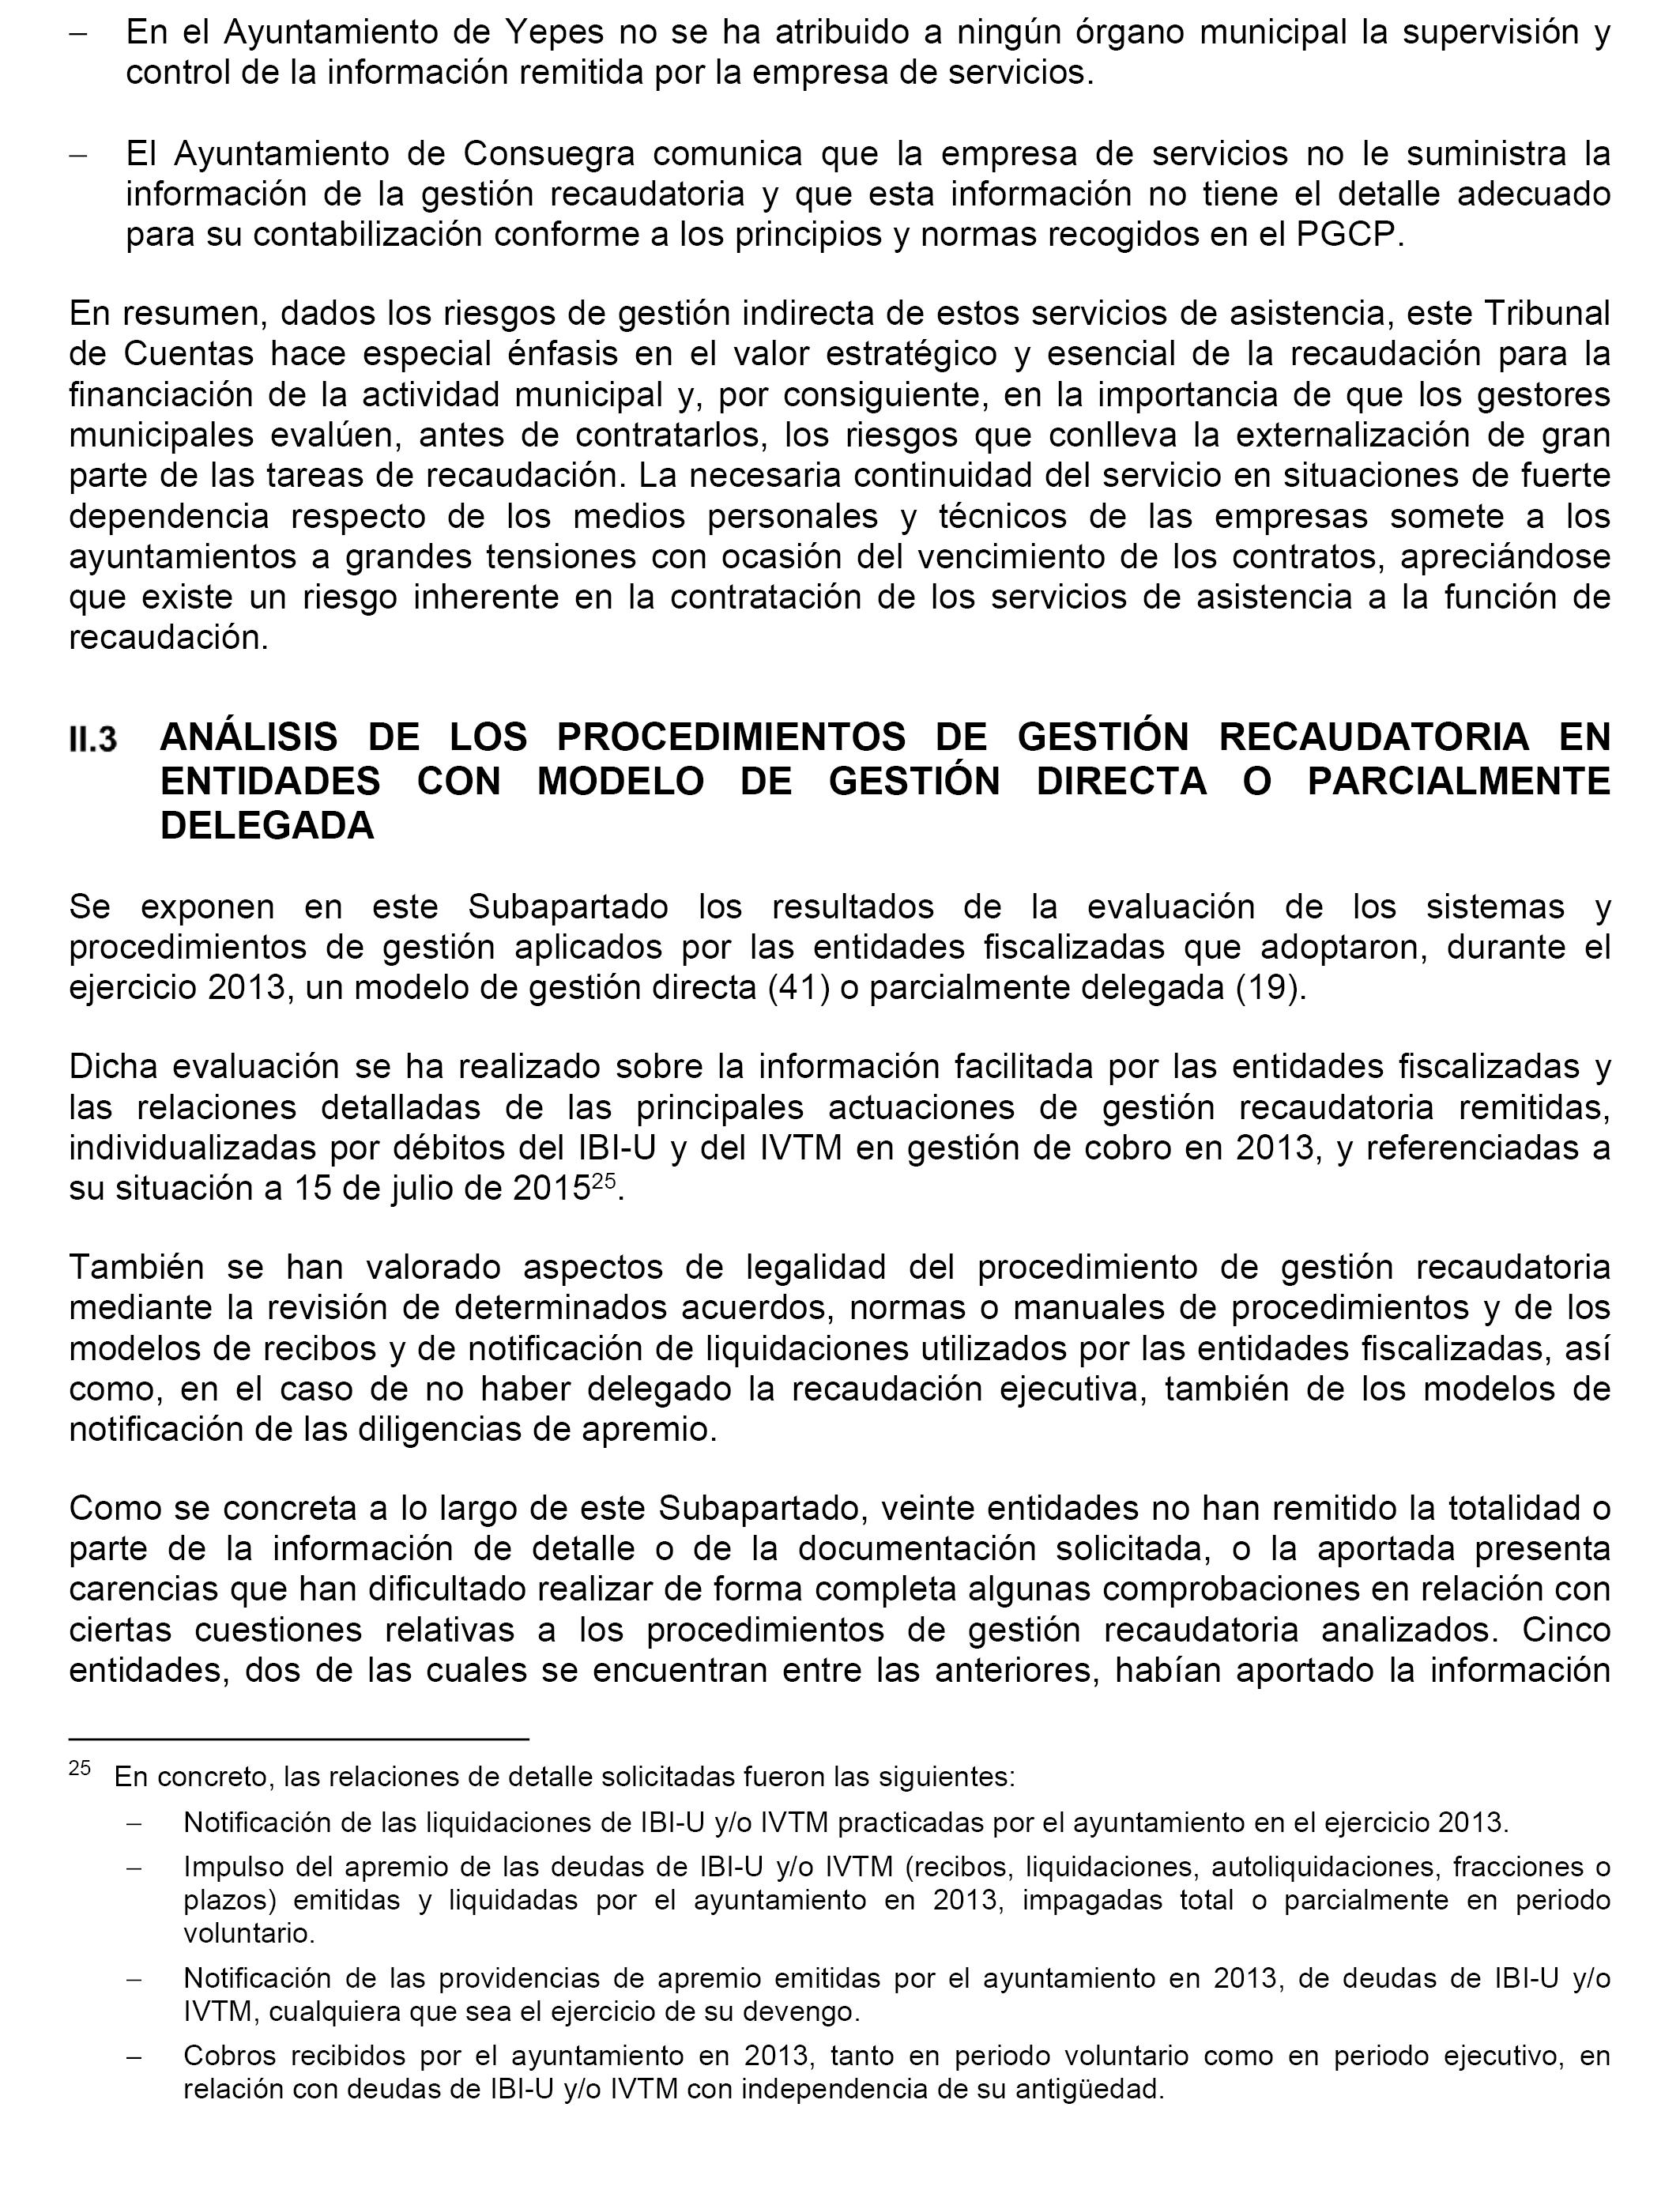 Stunning Formato De Resumen Ejecutivo Osce 2014 Ideas - Professional ...